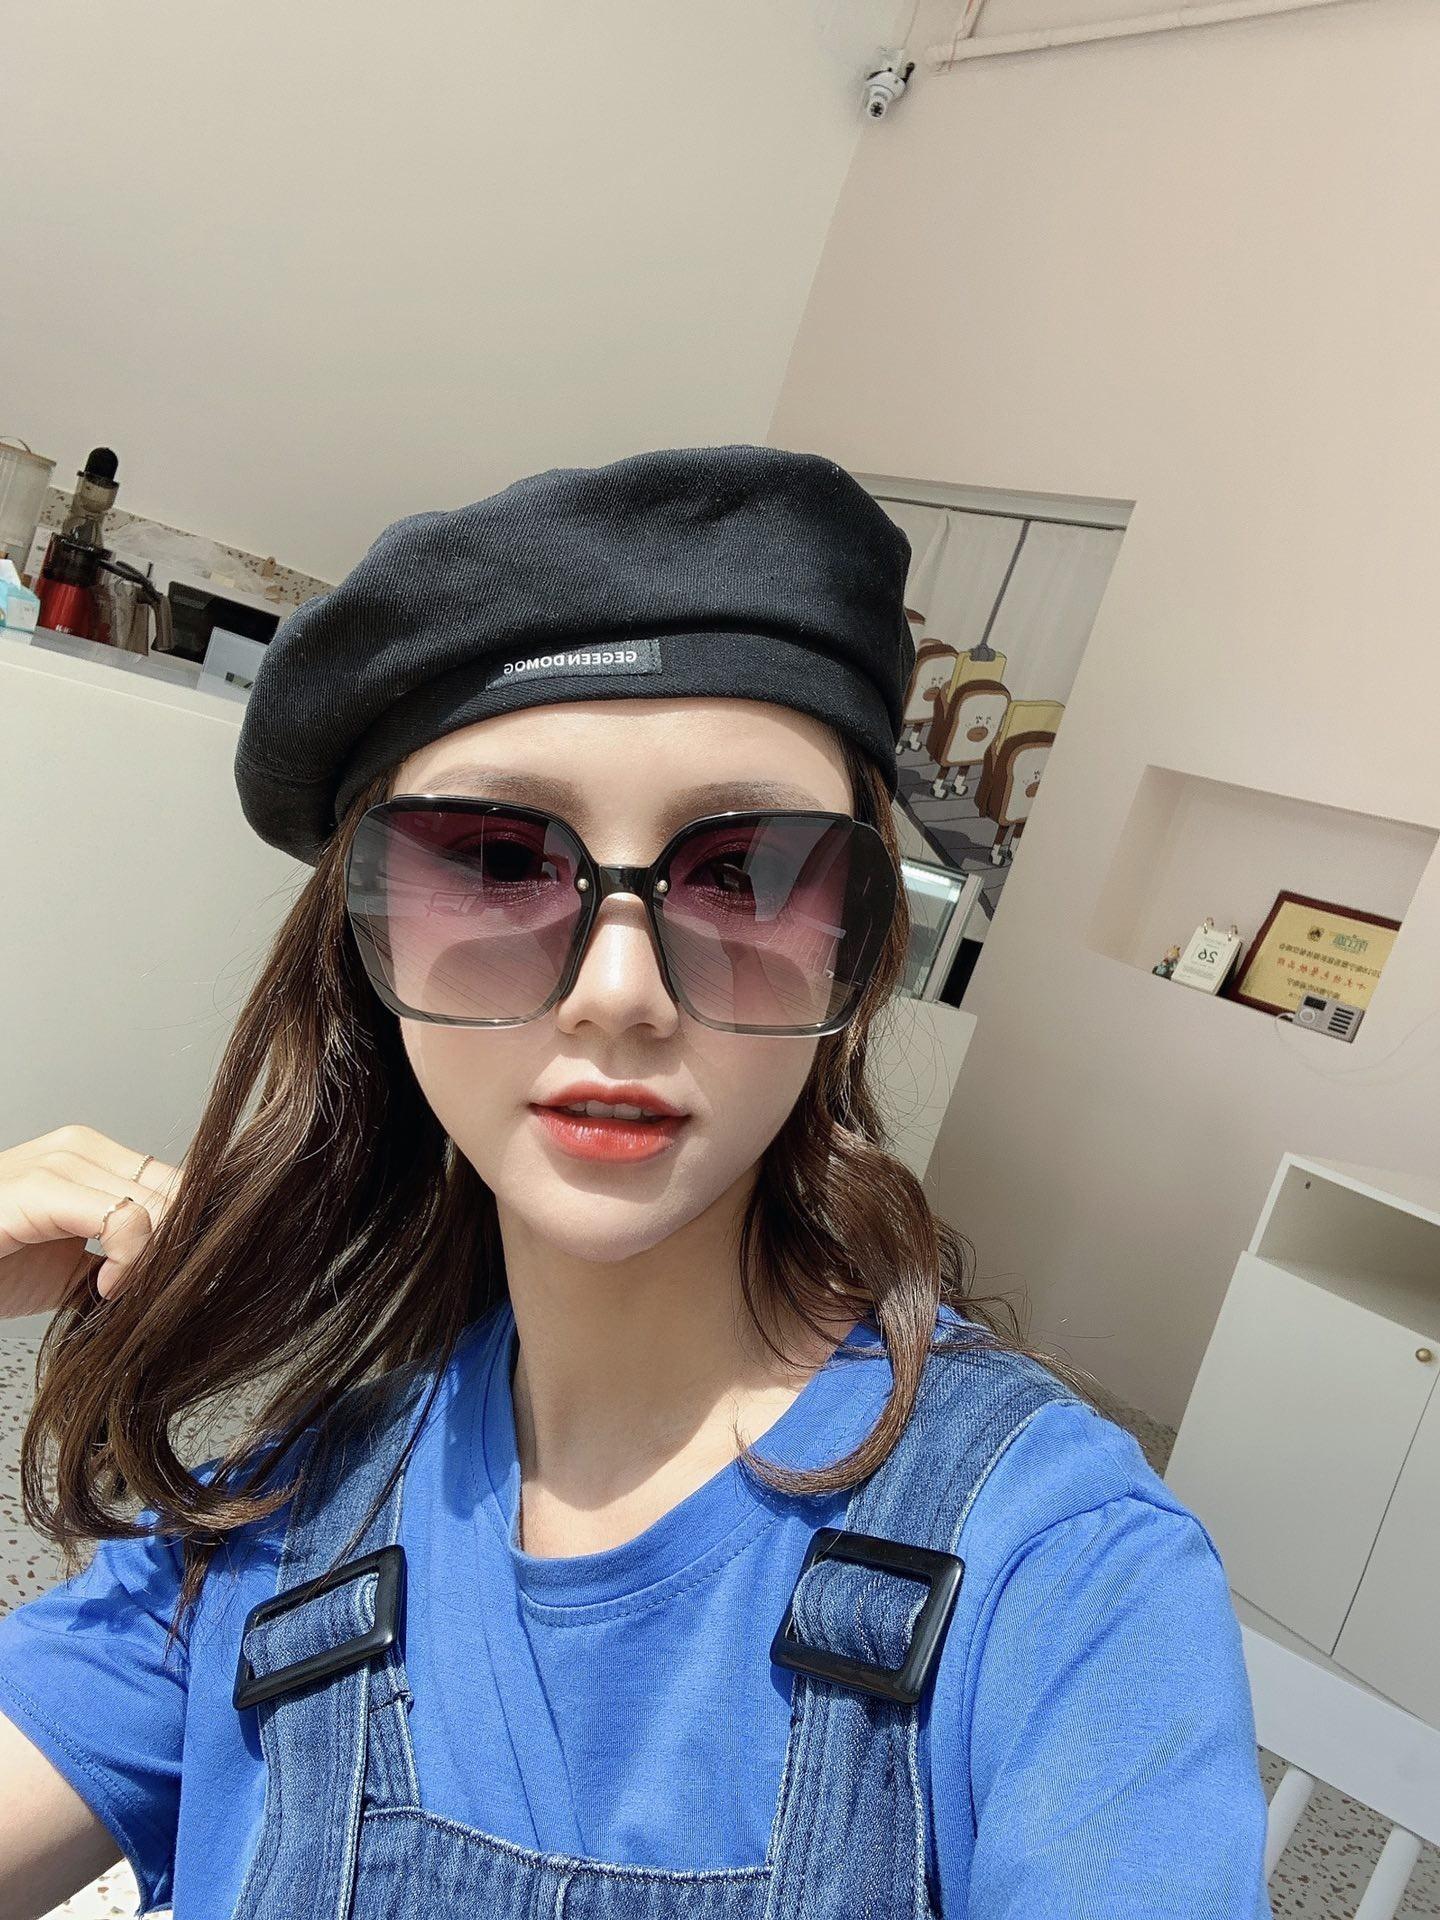 New top quality 5945 mens sunglasses men sun glasses women sunglasses fashion style protects eyes Gafas de sol lunettes de soleil with box